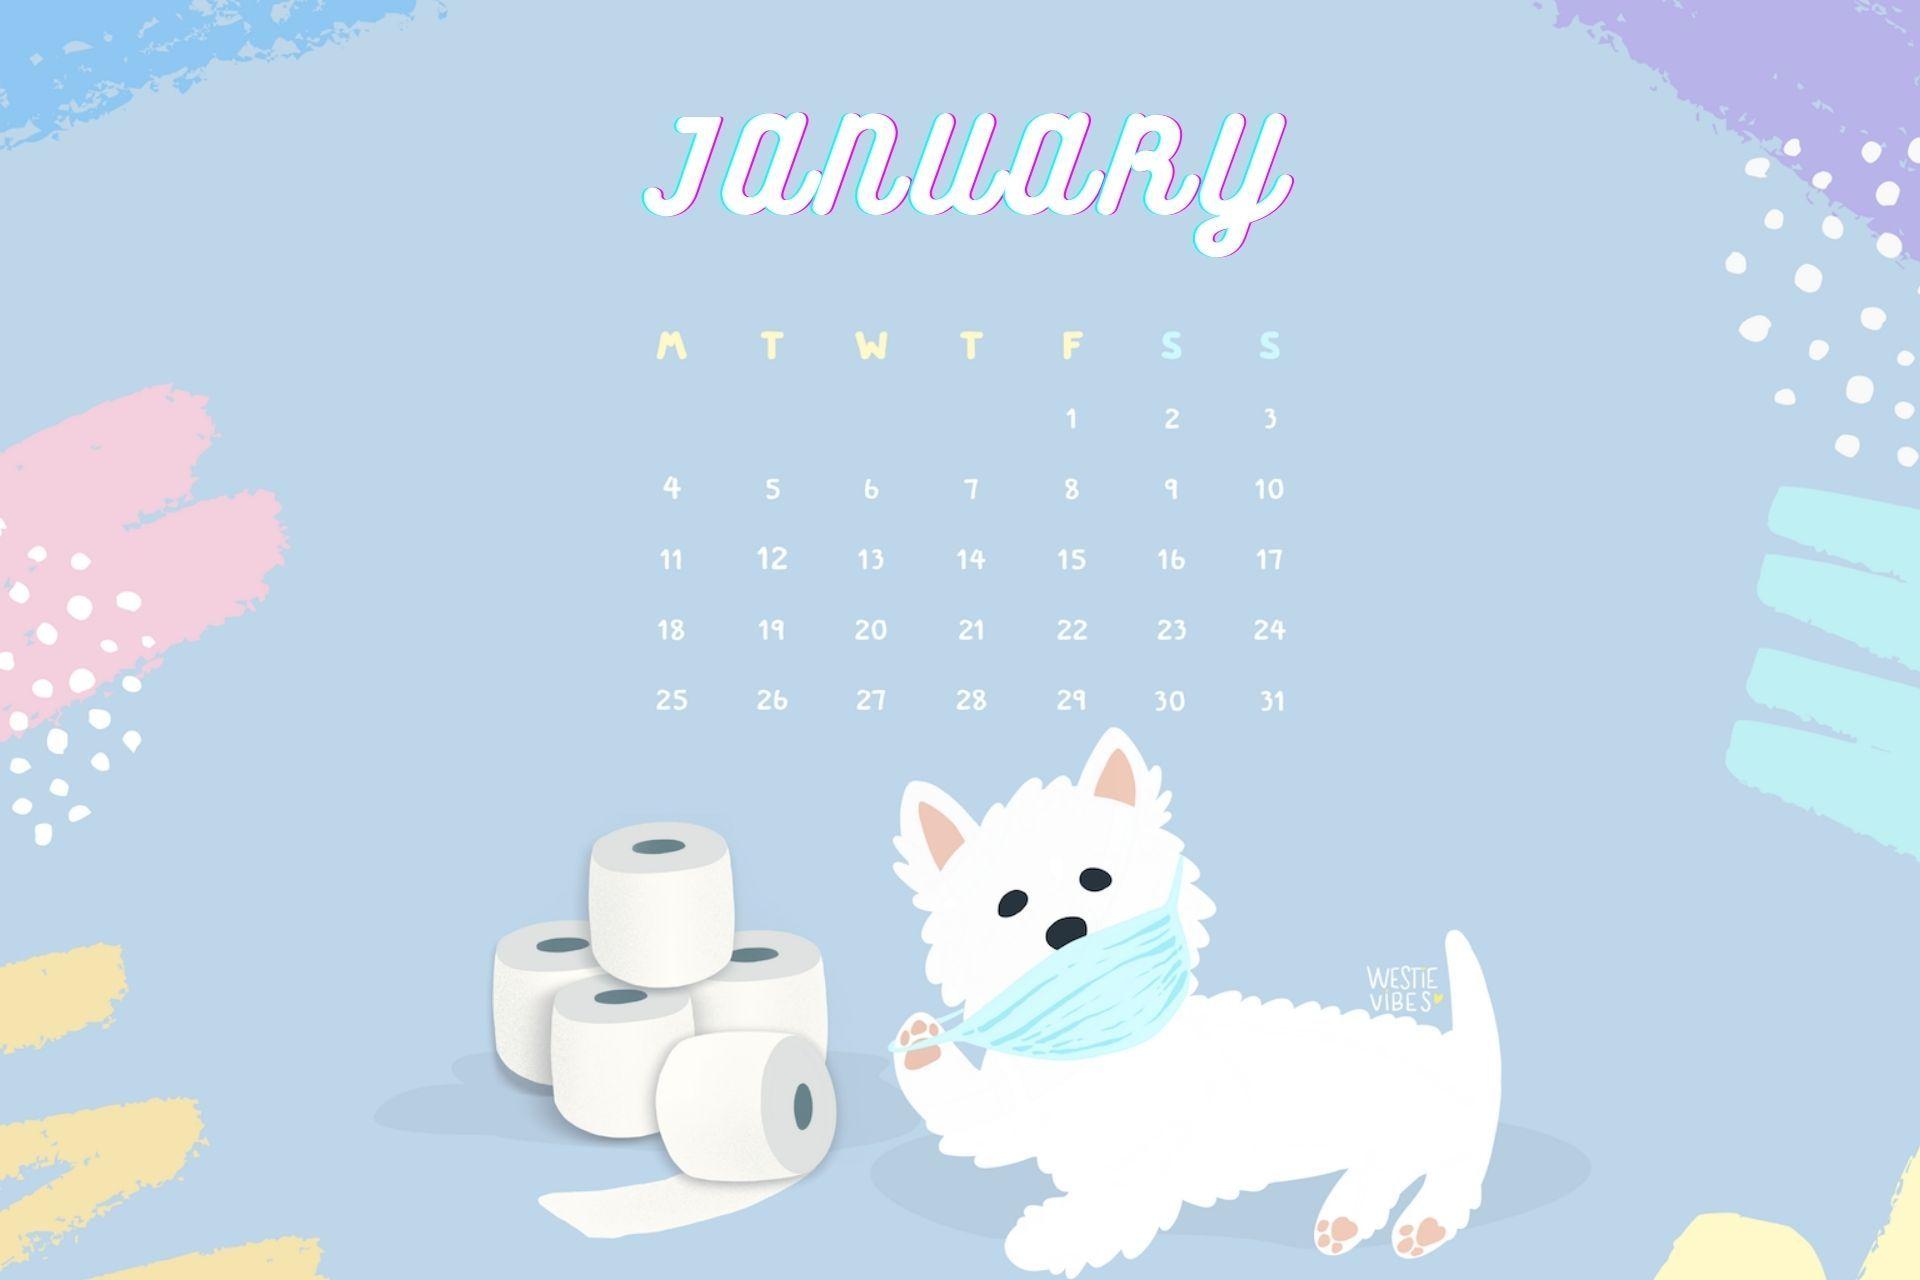 January 2021 Calendar Wallpapers 1920x1280